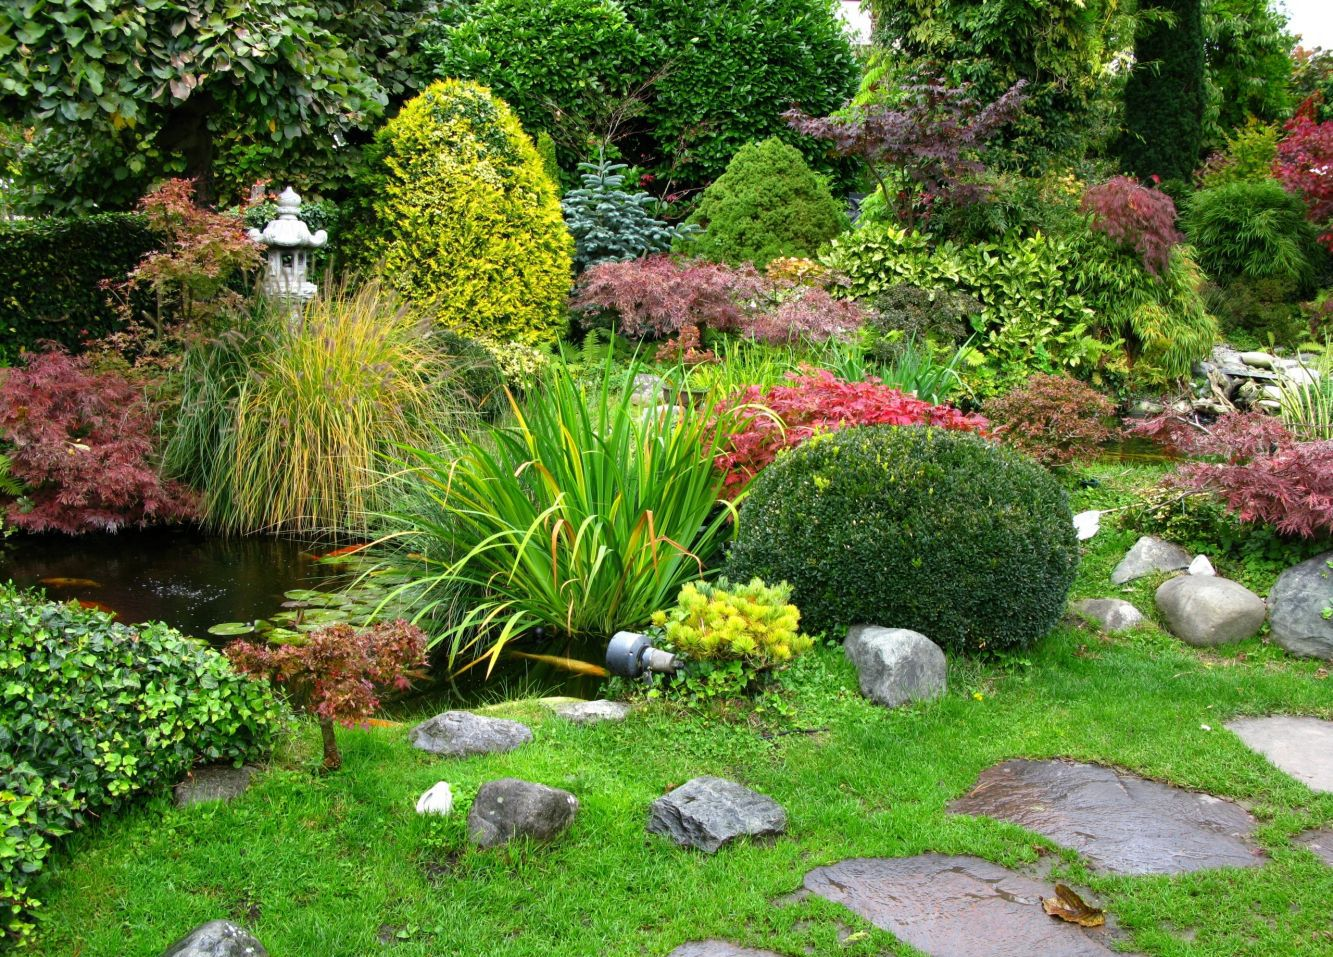 At Ledford's Lawn & Landscaping LLC,